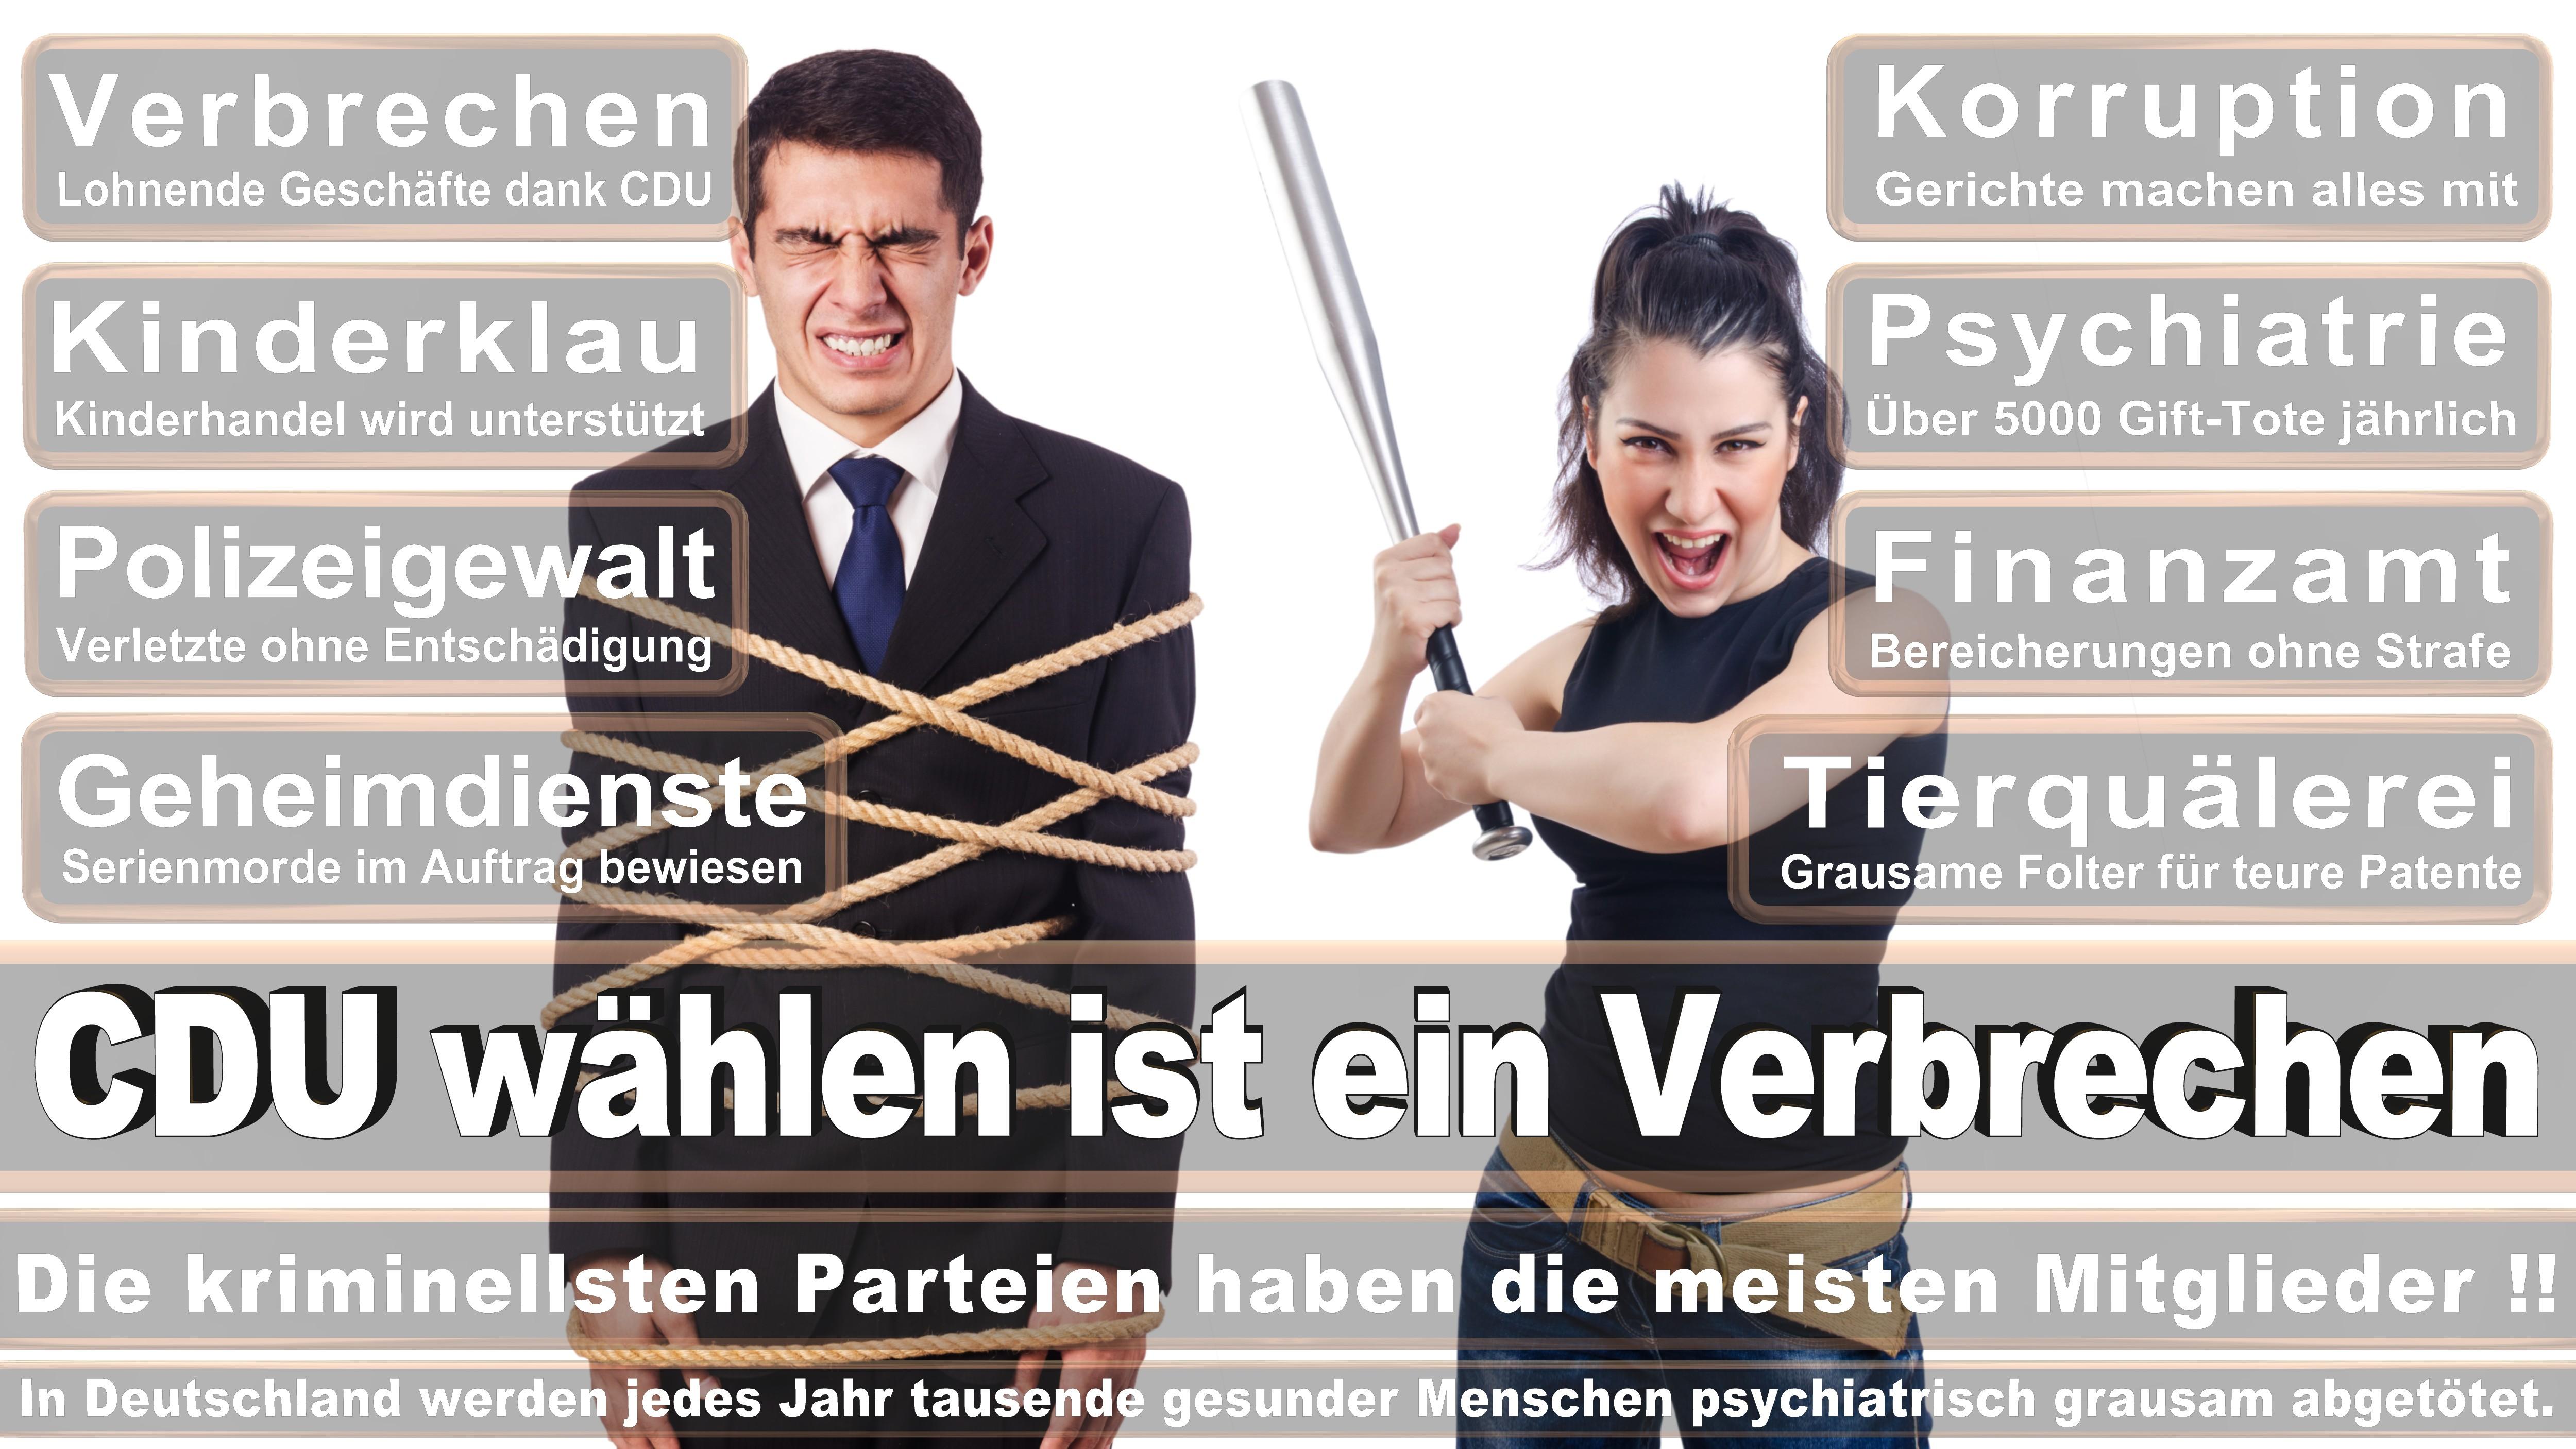 Hermann Gröhe CDU CSU Politiker